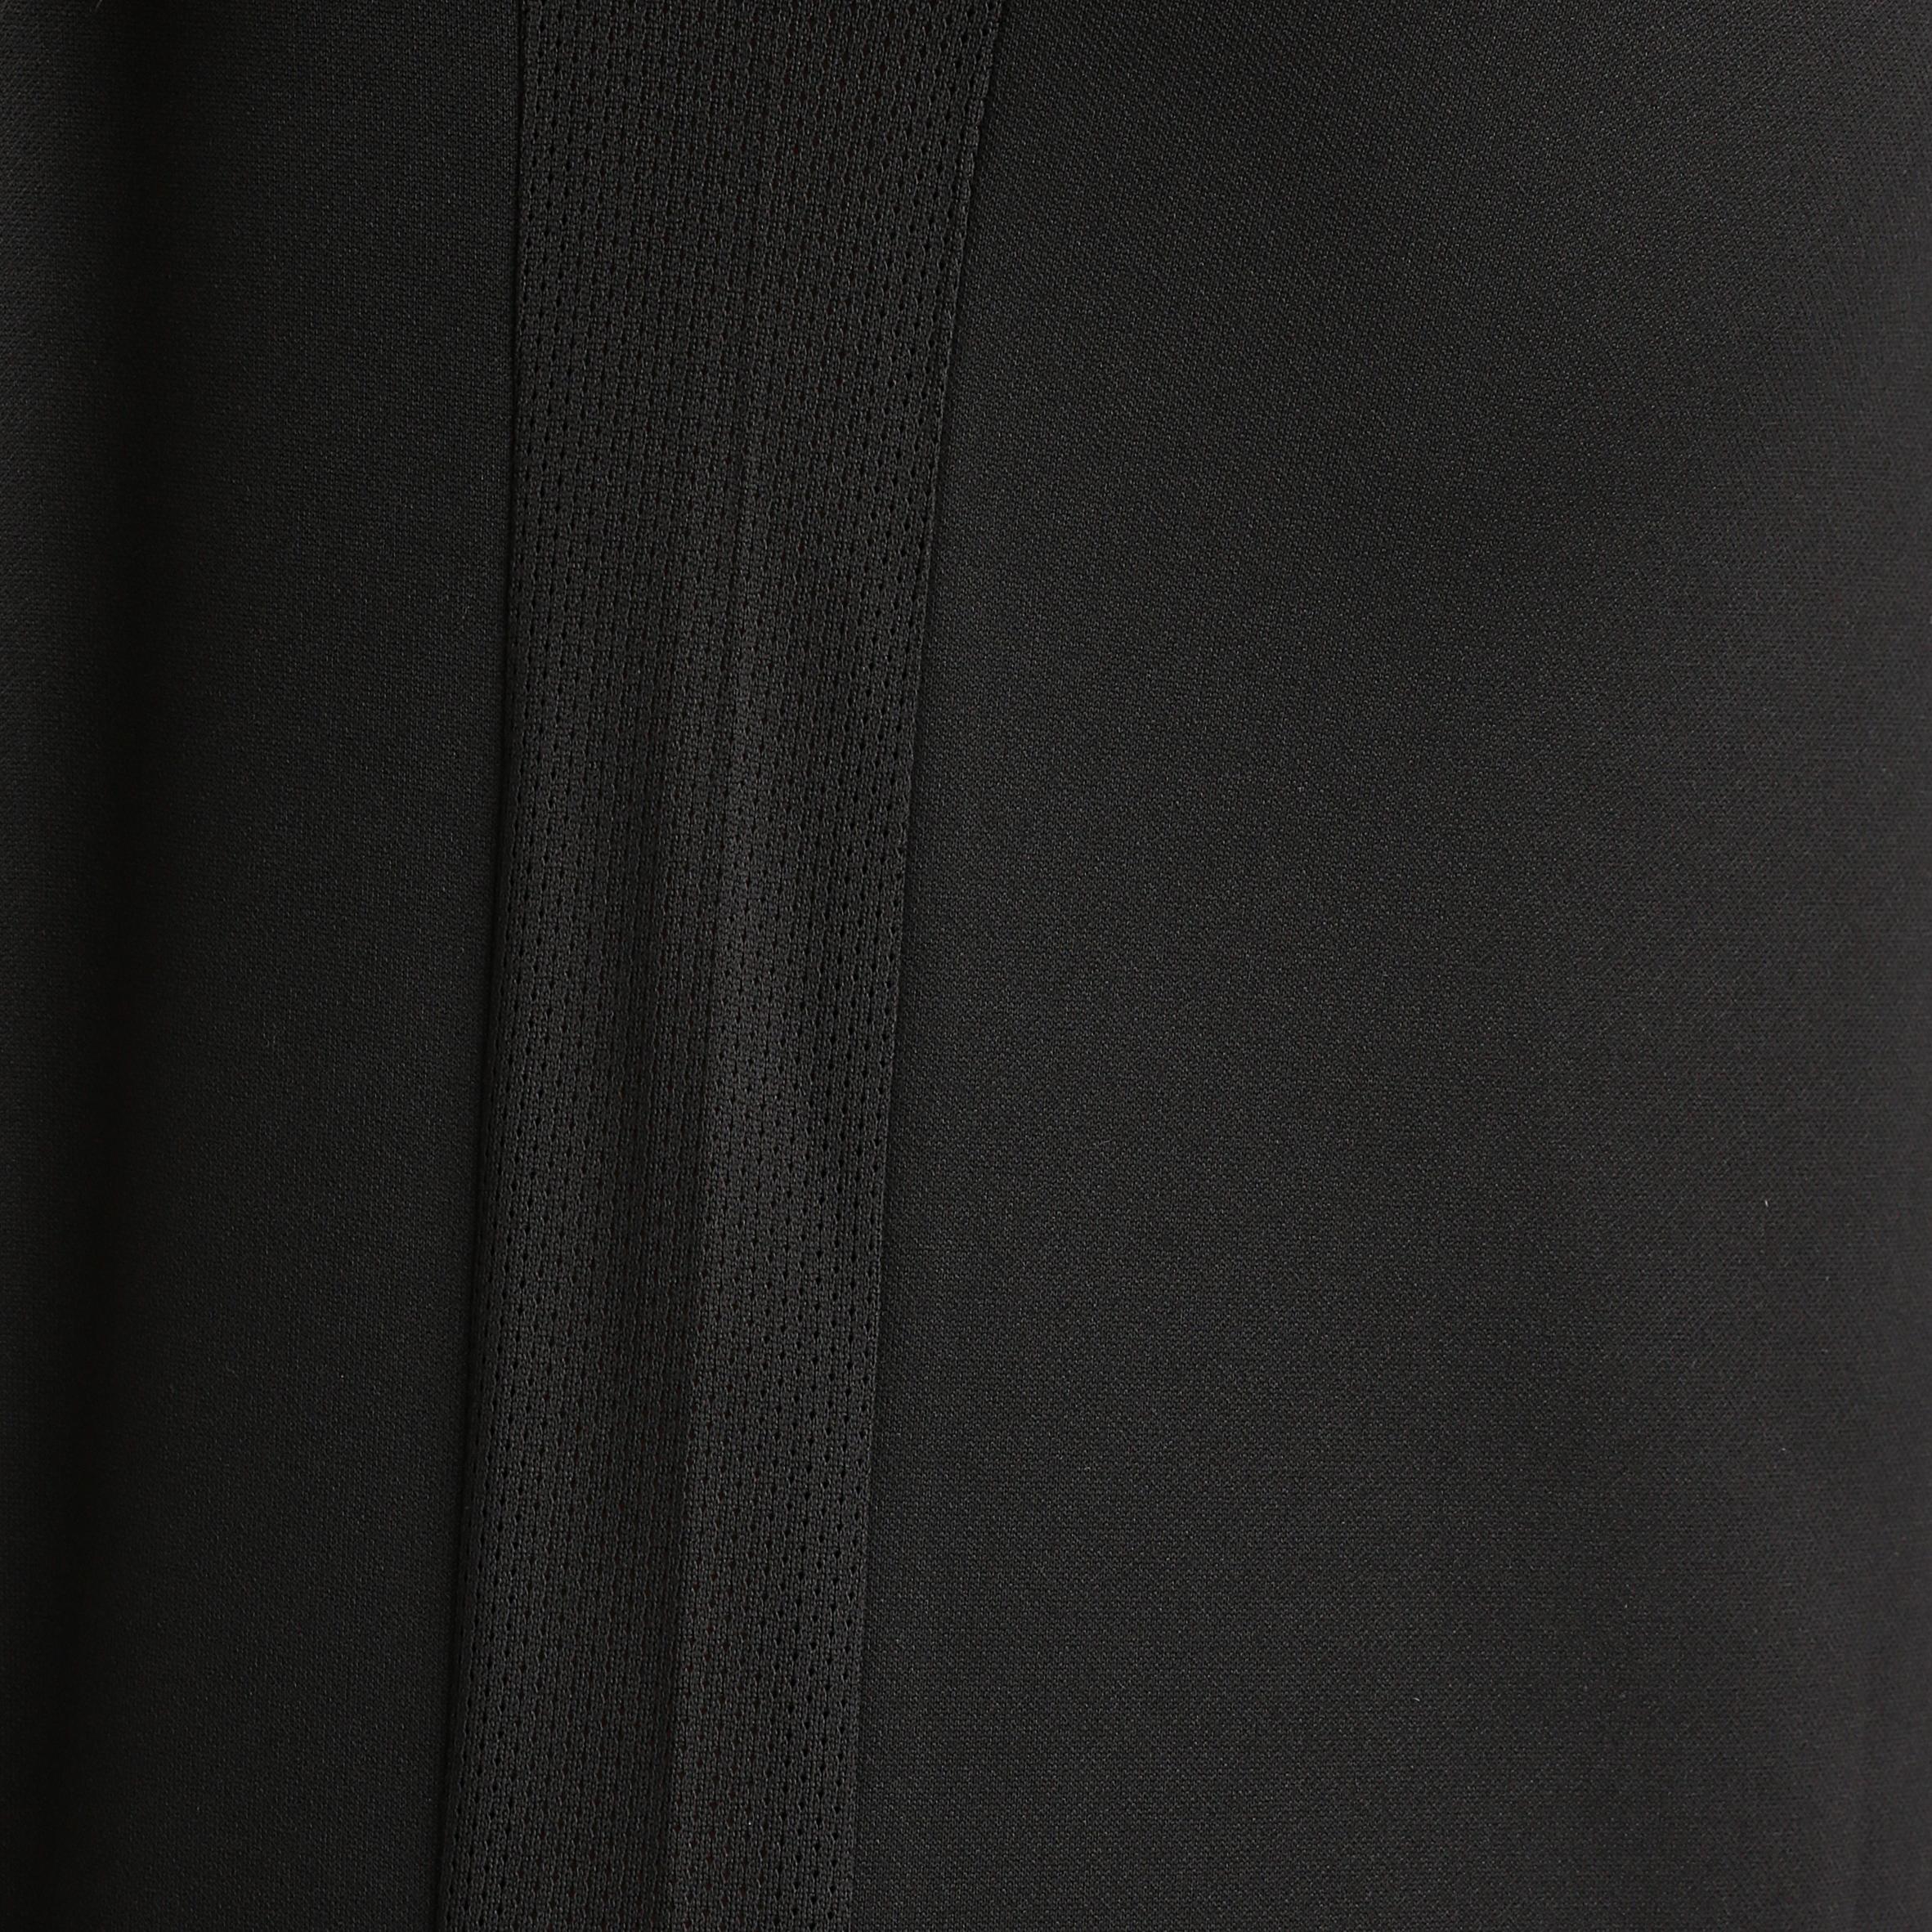 F100 Adult Football Jersey - Black